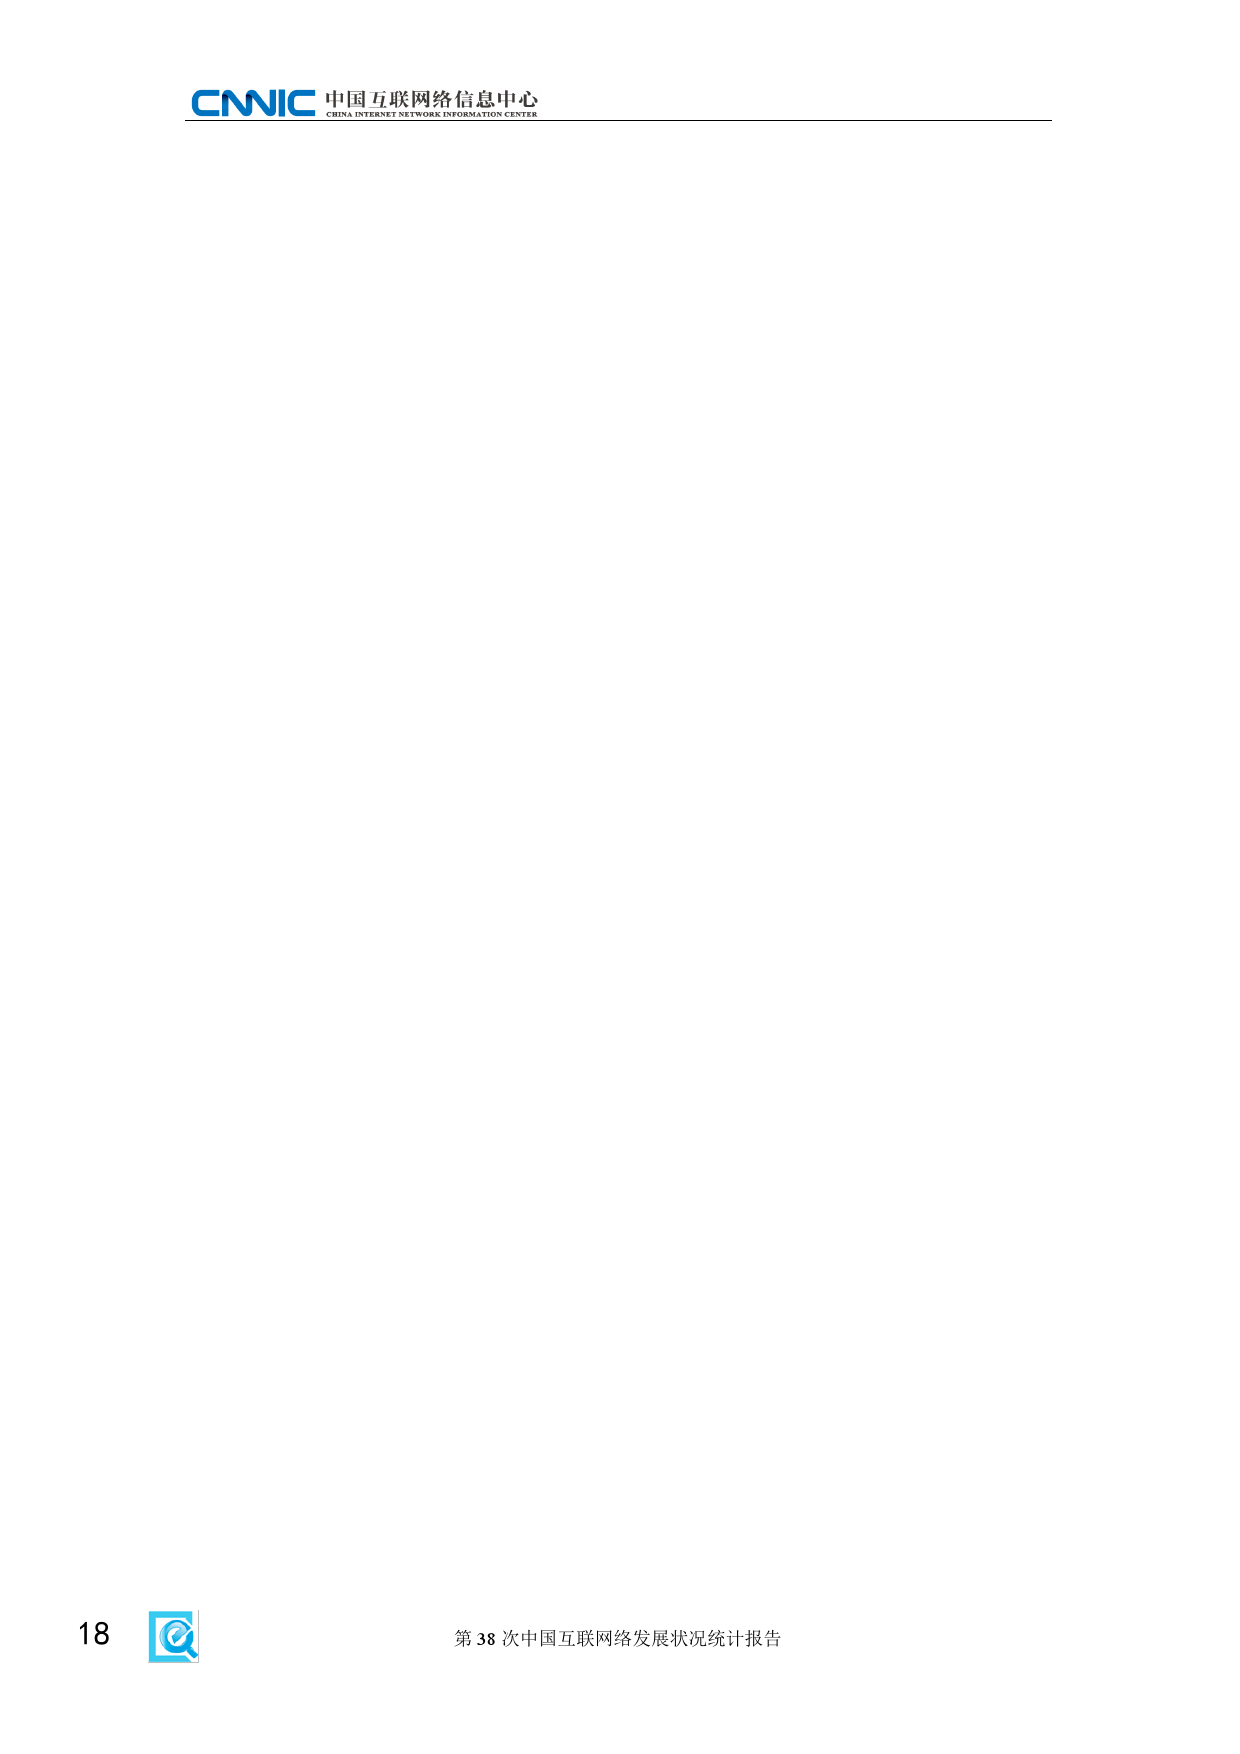 CNNIC:2015年第38次中国互联网络发展状况统计报告_000024